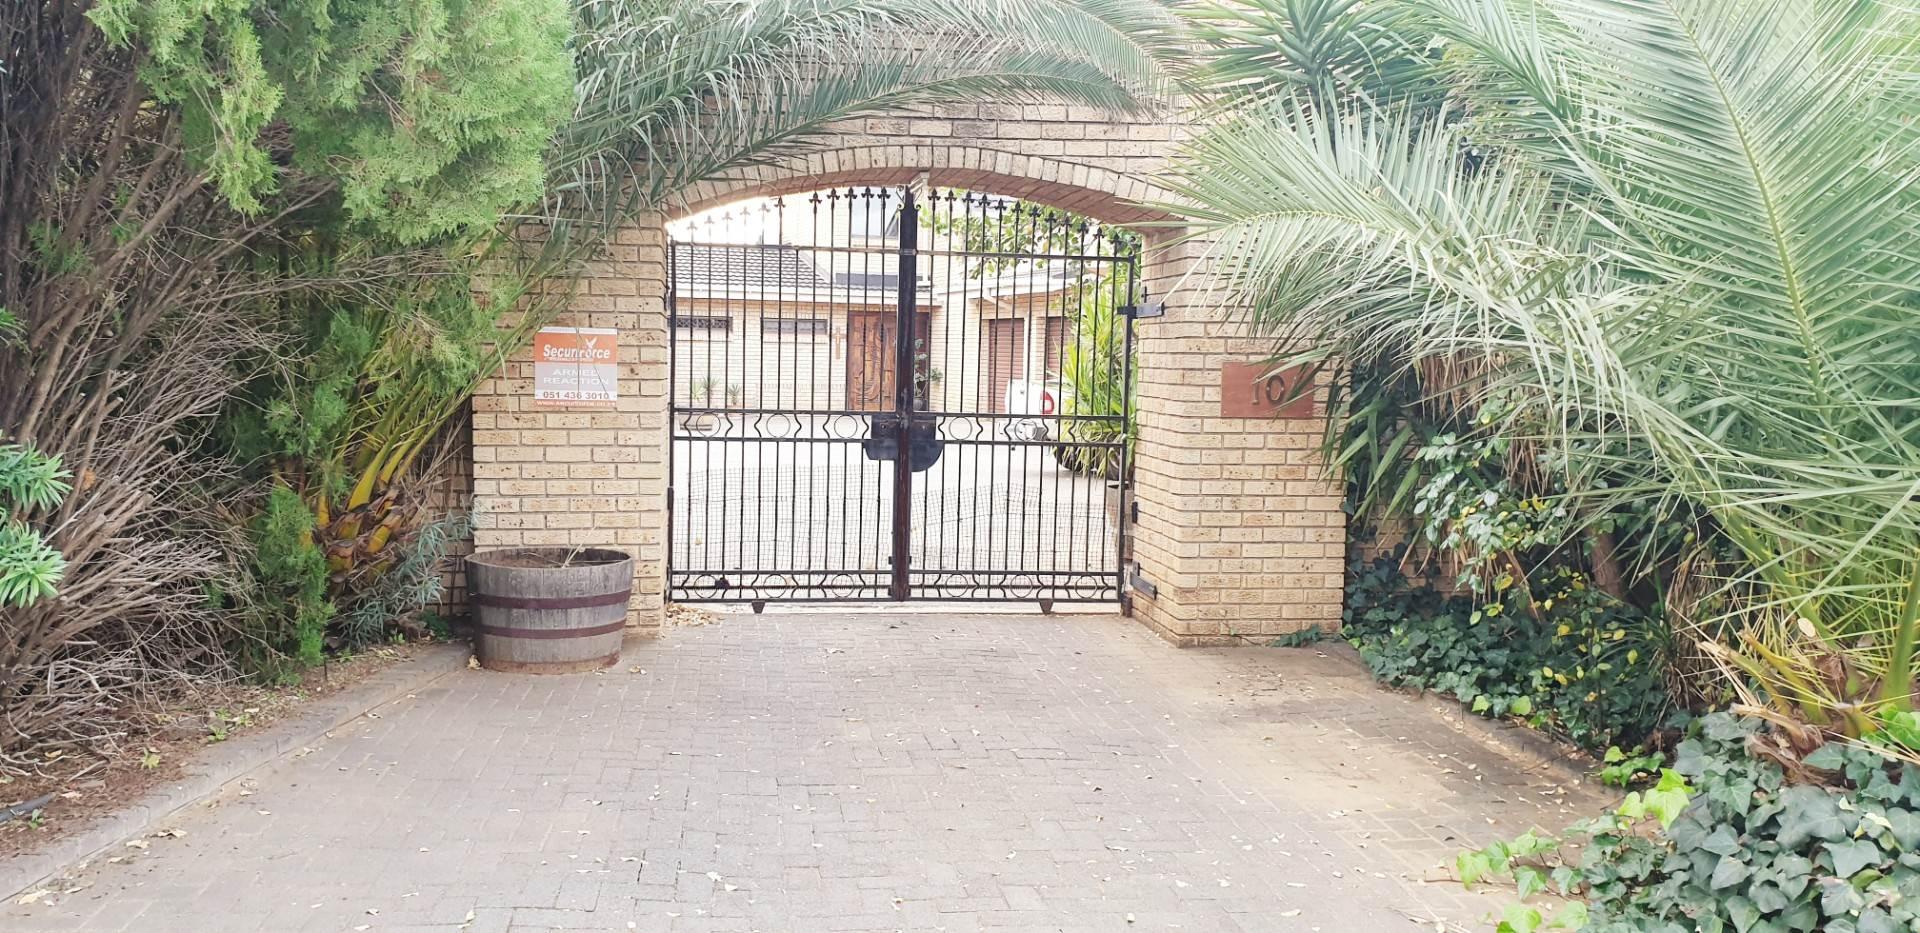 Entrance secure